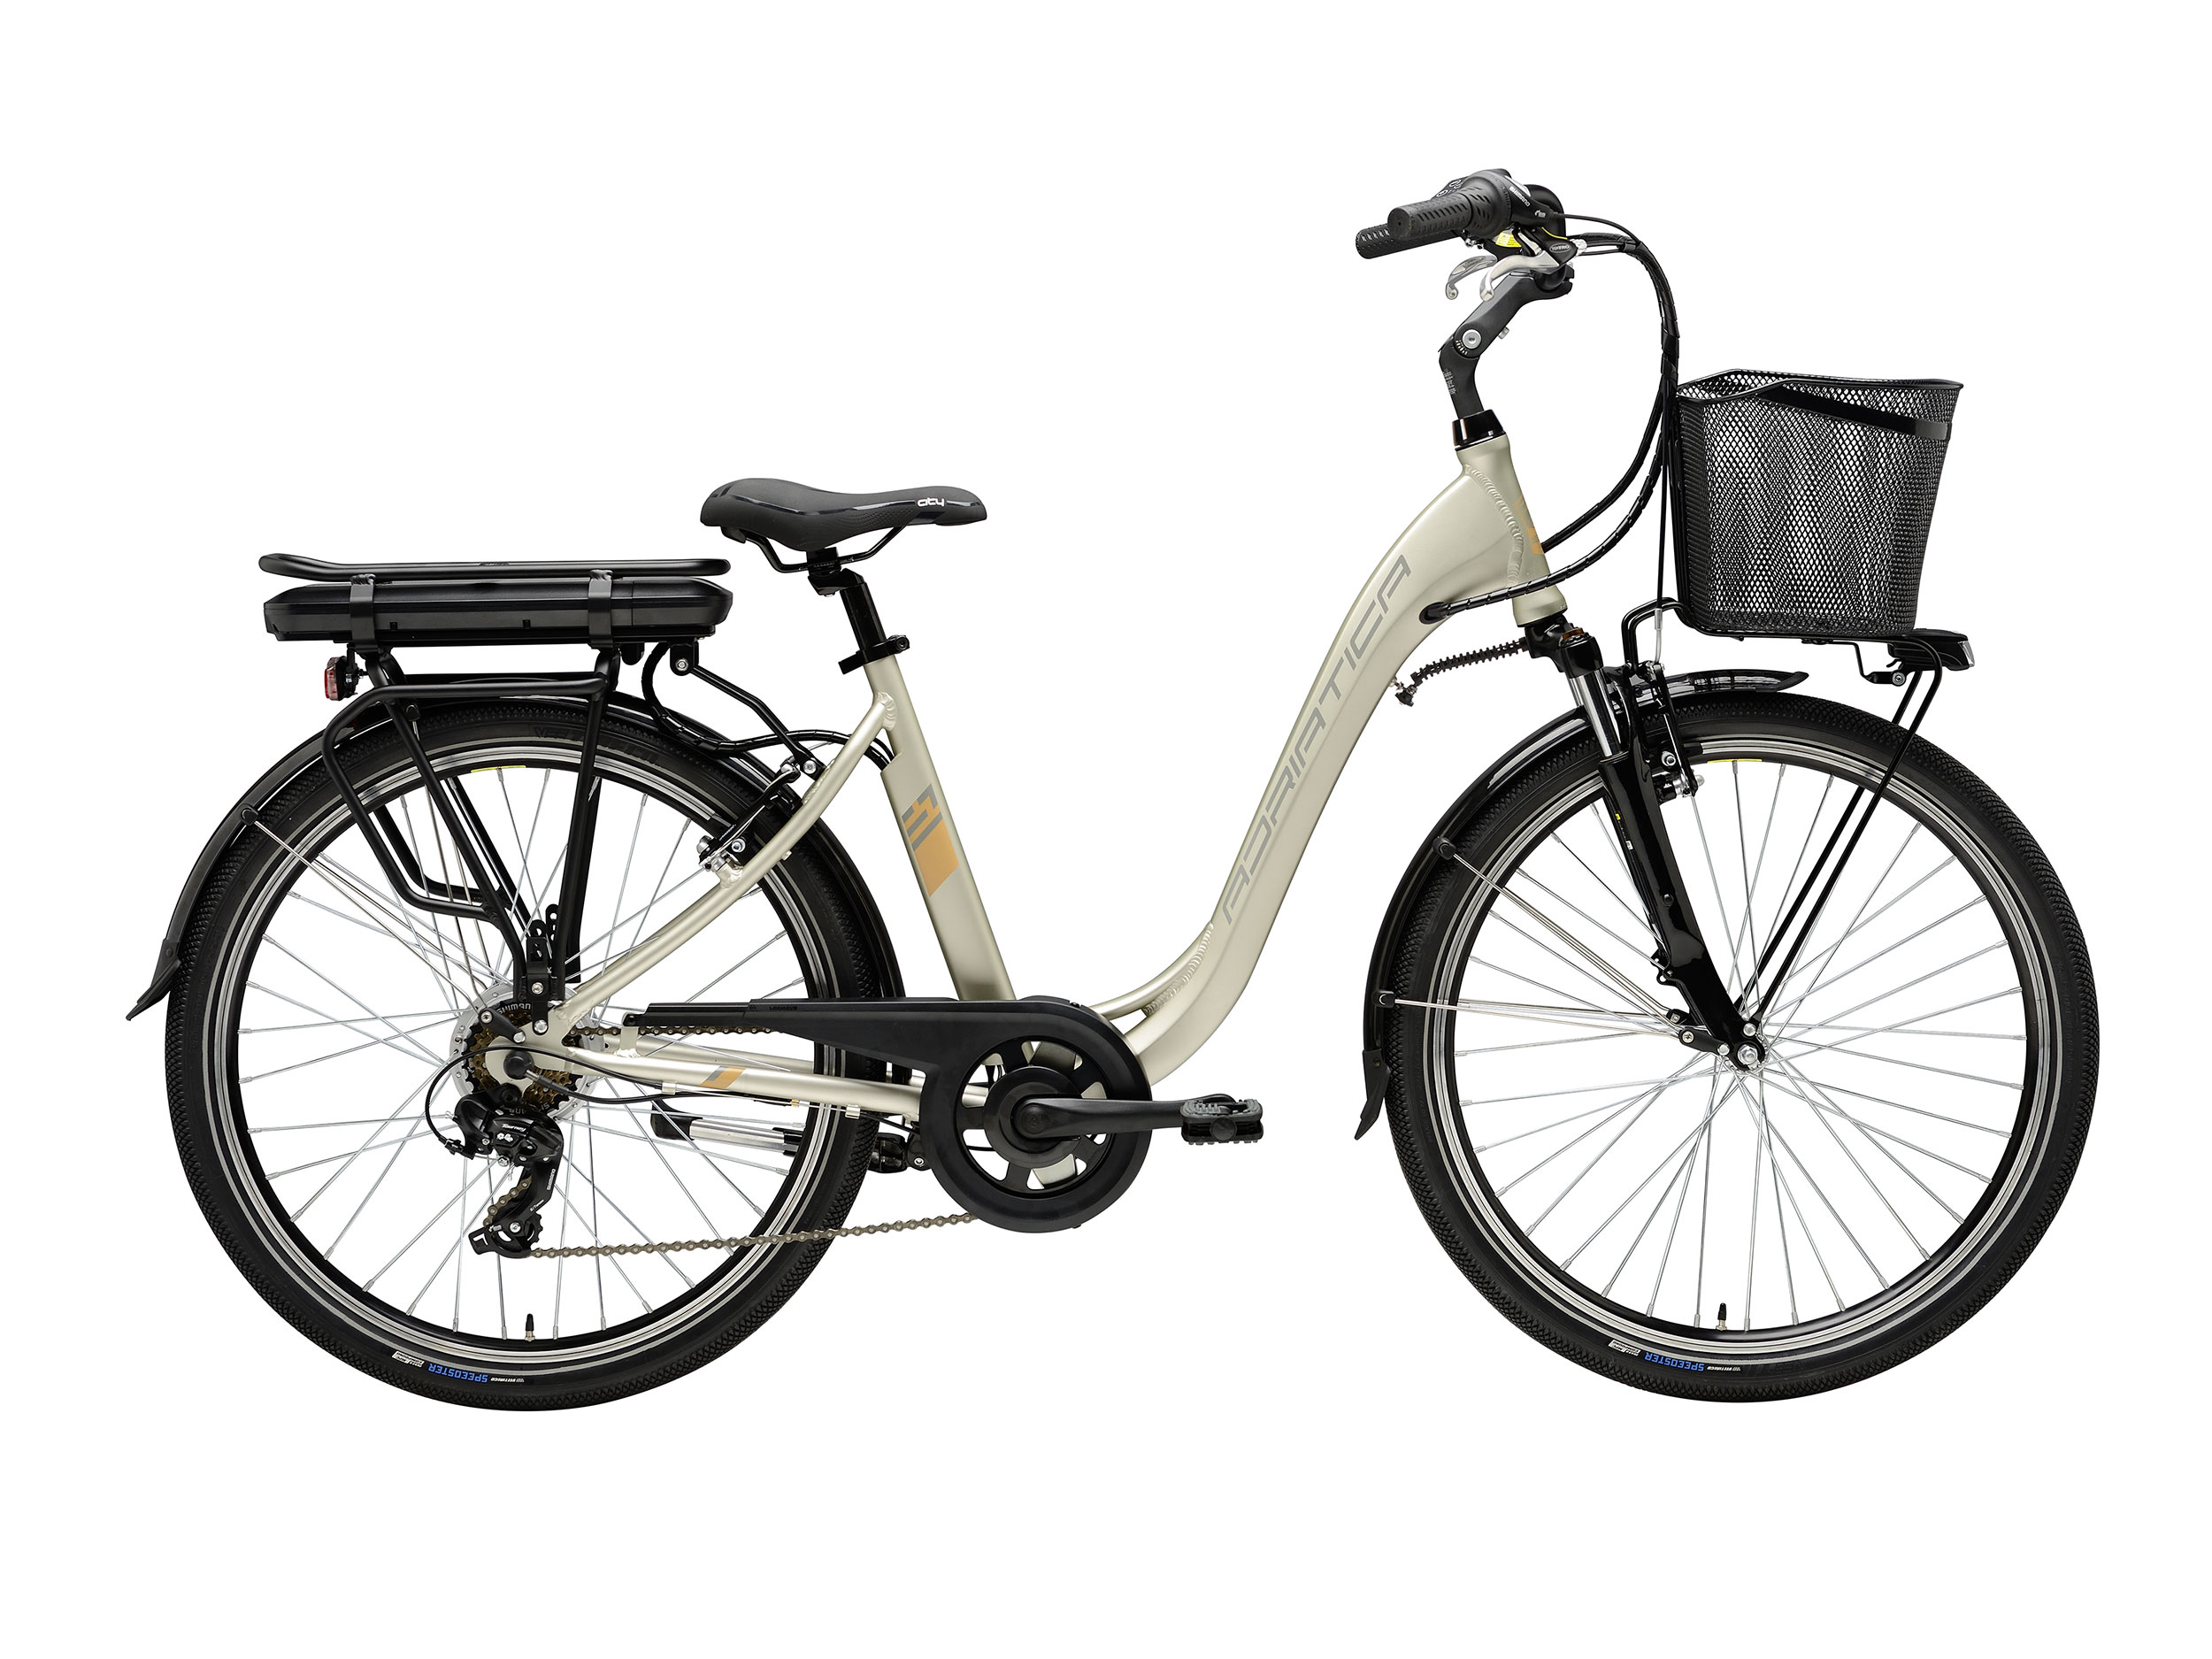 bicicleta e-bike e1 adriatica go by bike